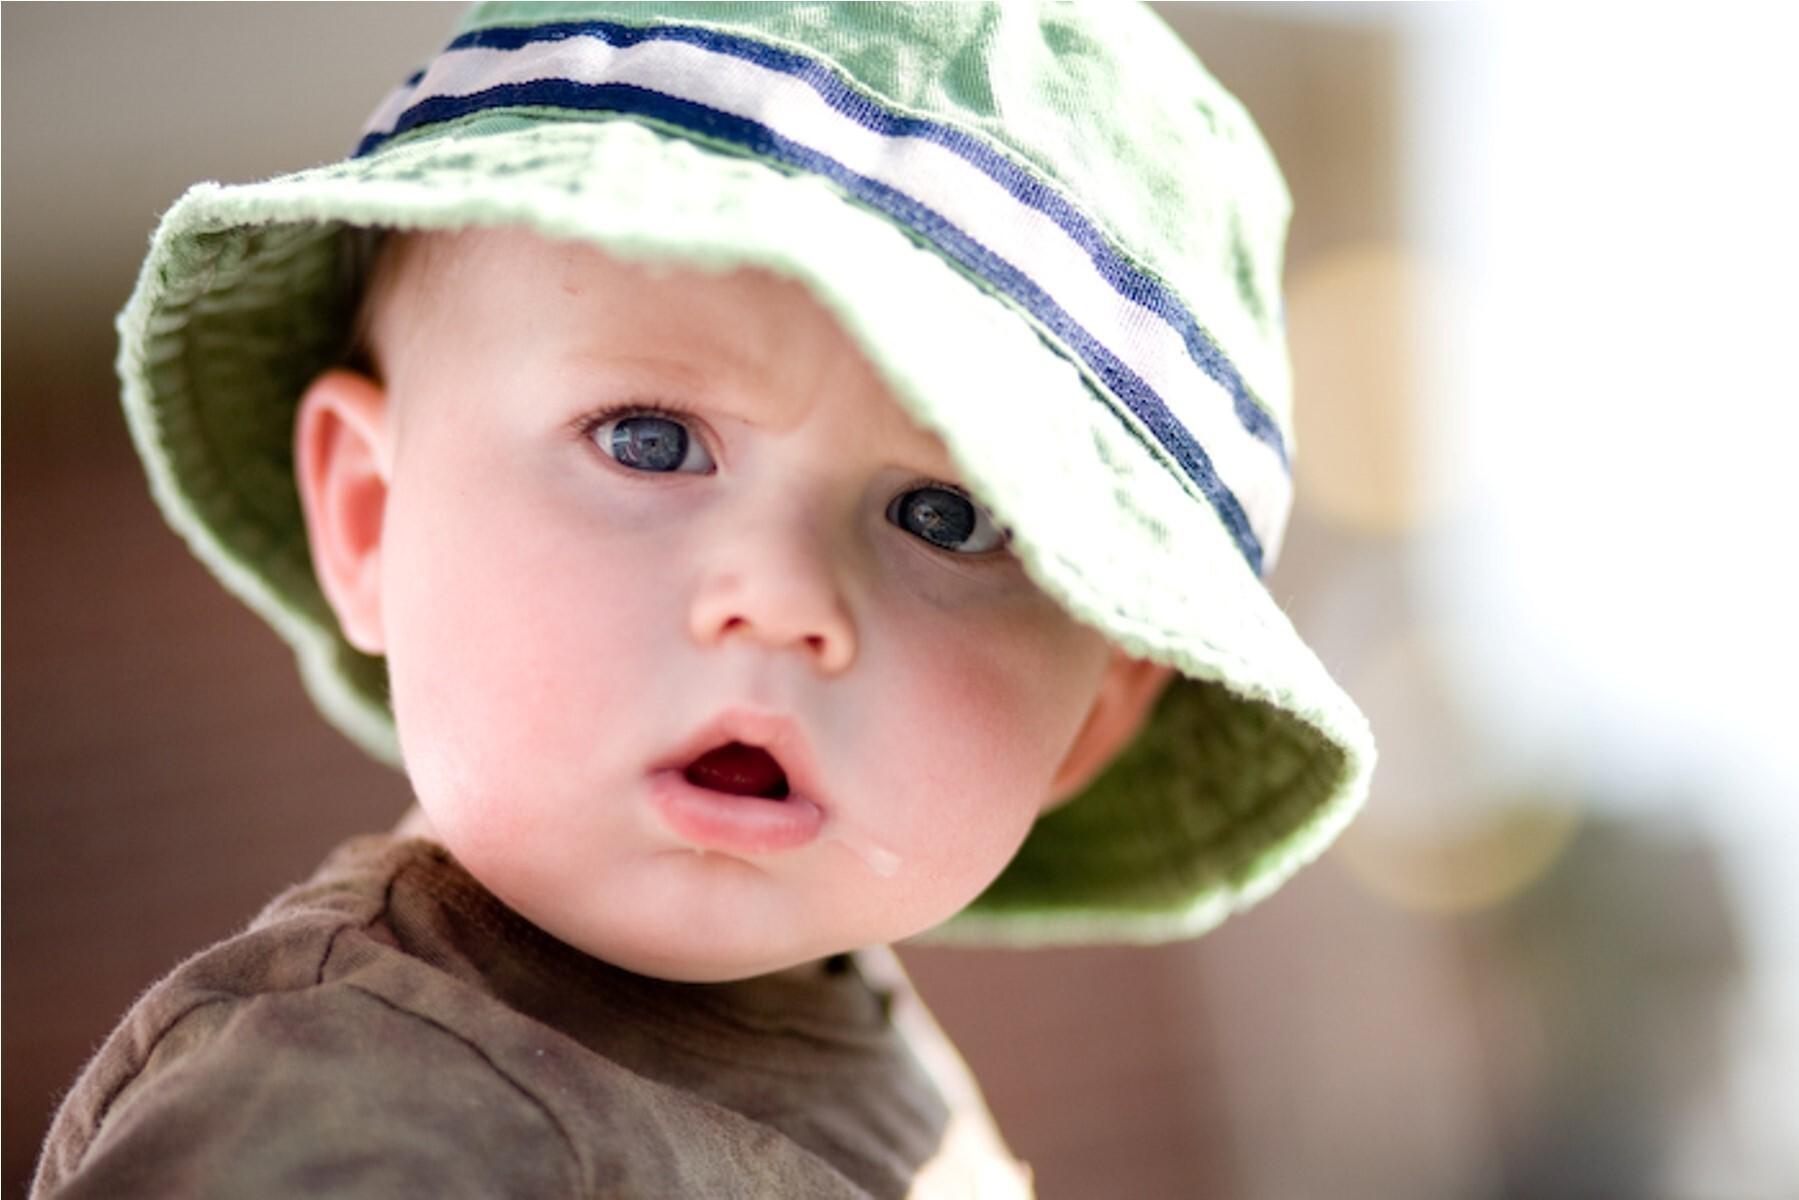 Cute Baby Boy Wear Round Cap HD Pics | HD Wallpapers